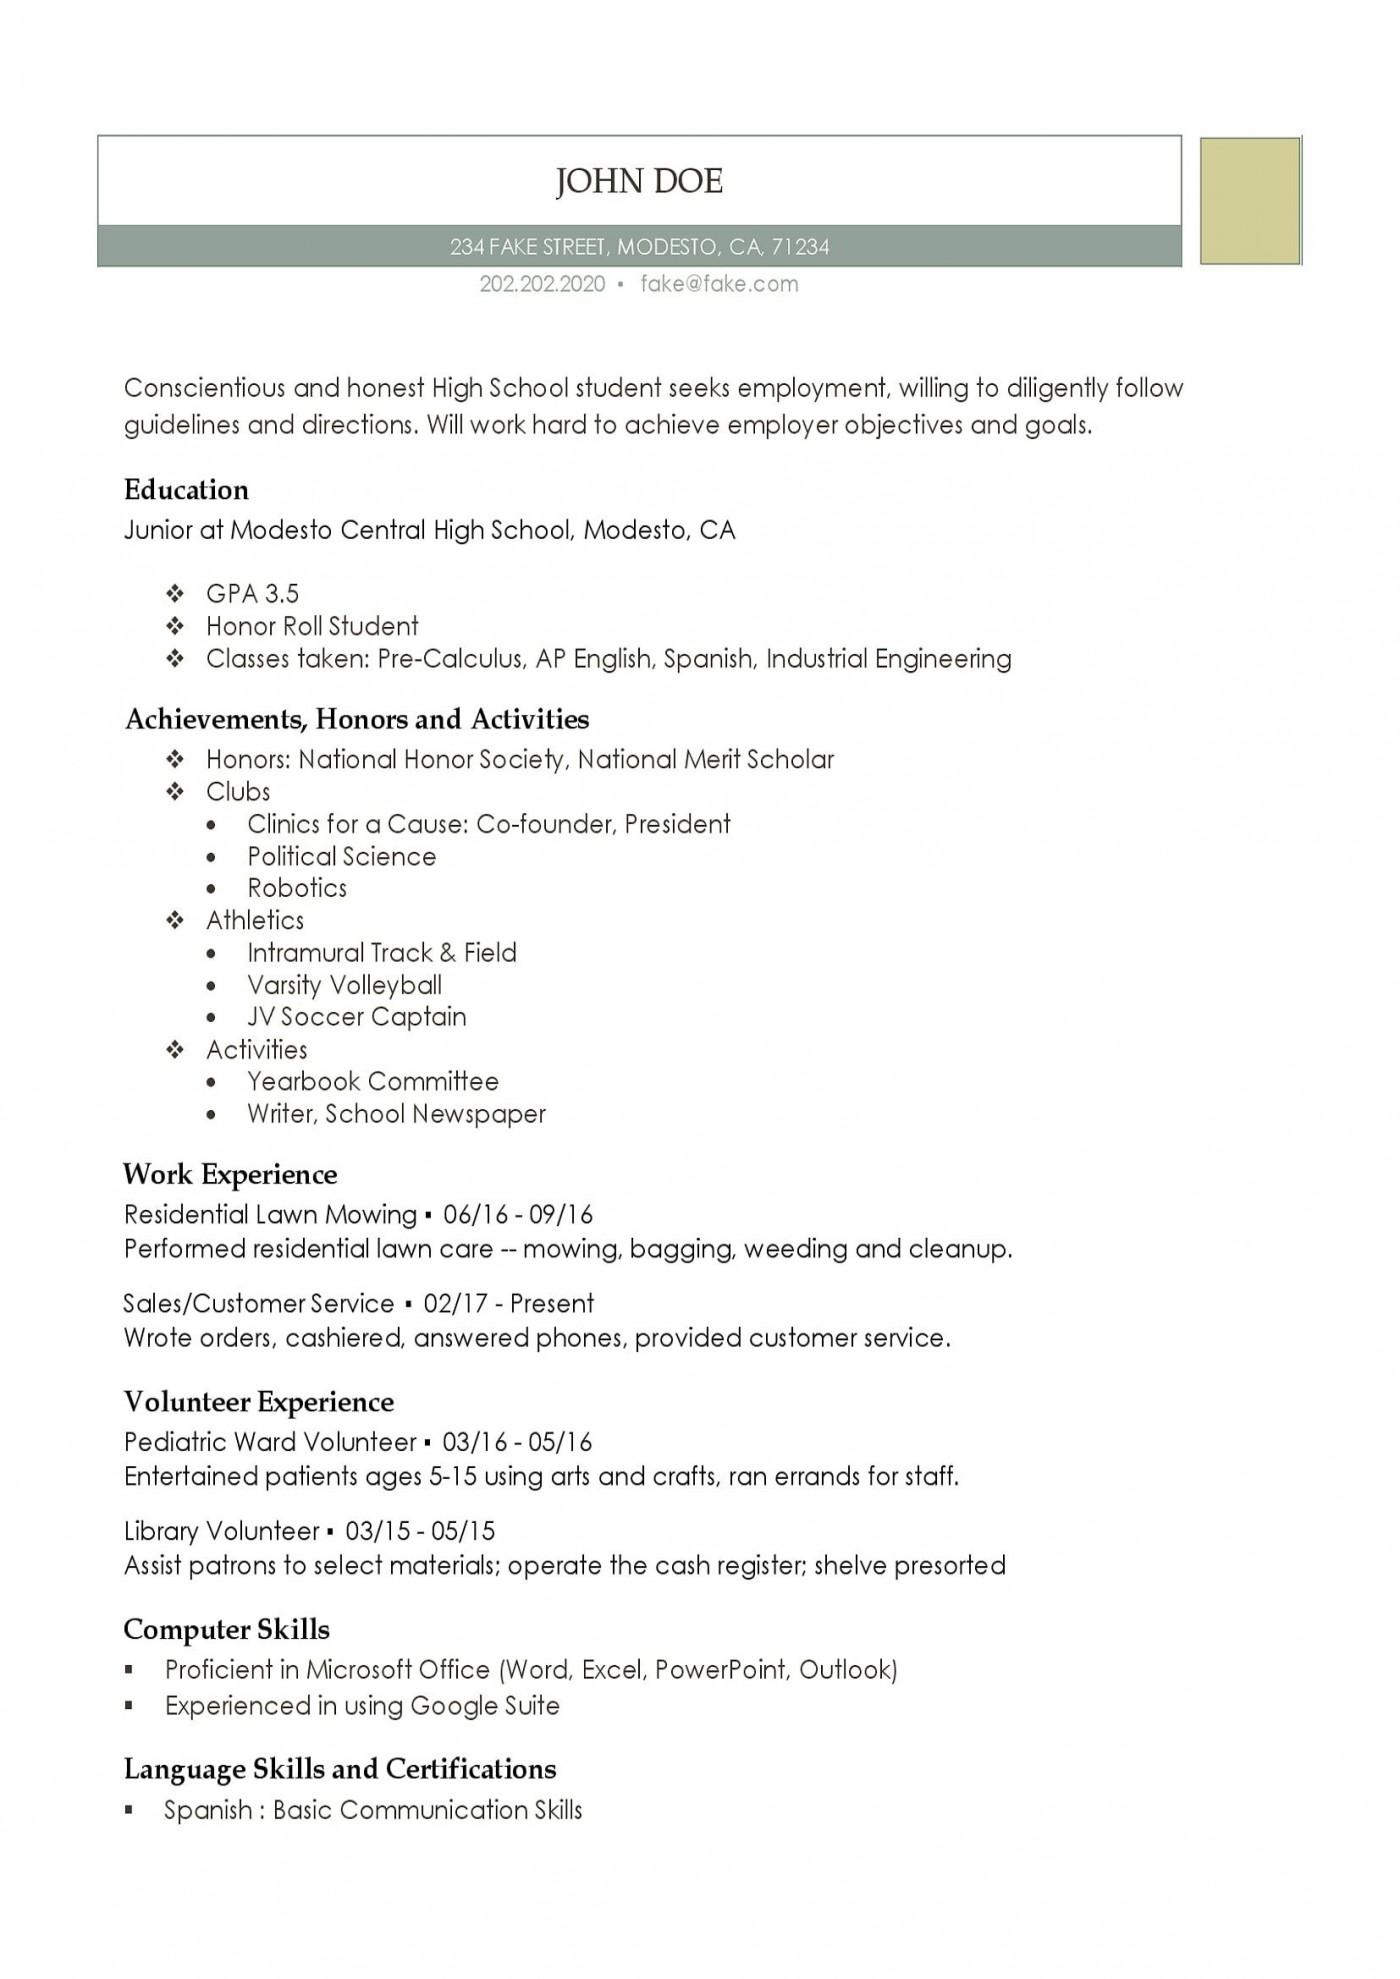 003 Stunning Resume Template For Teen Design  Teenager First Job Australia1400